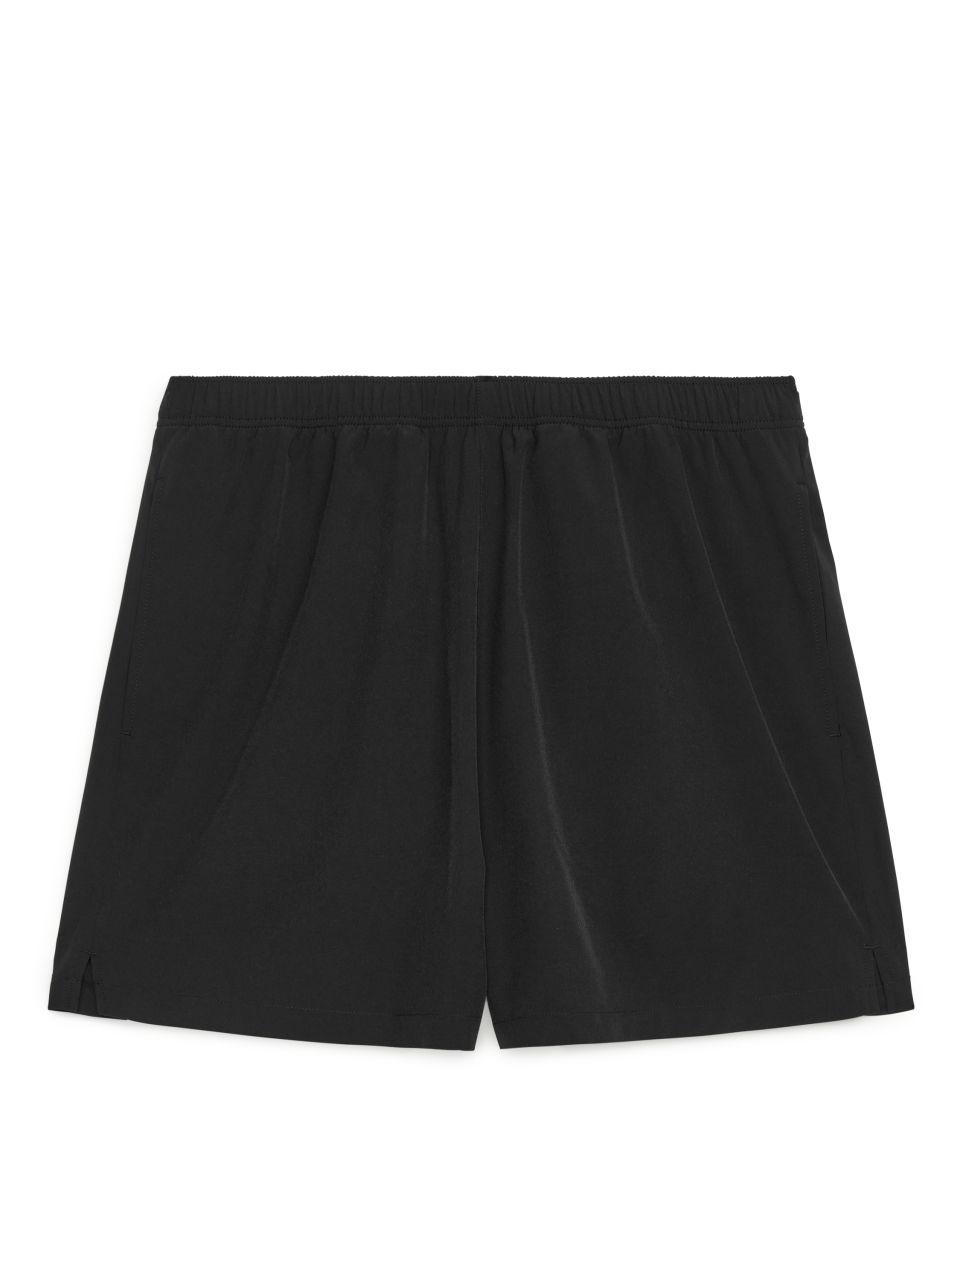 Training Shorts - Black